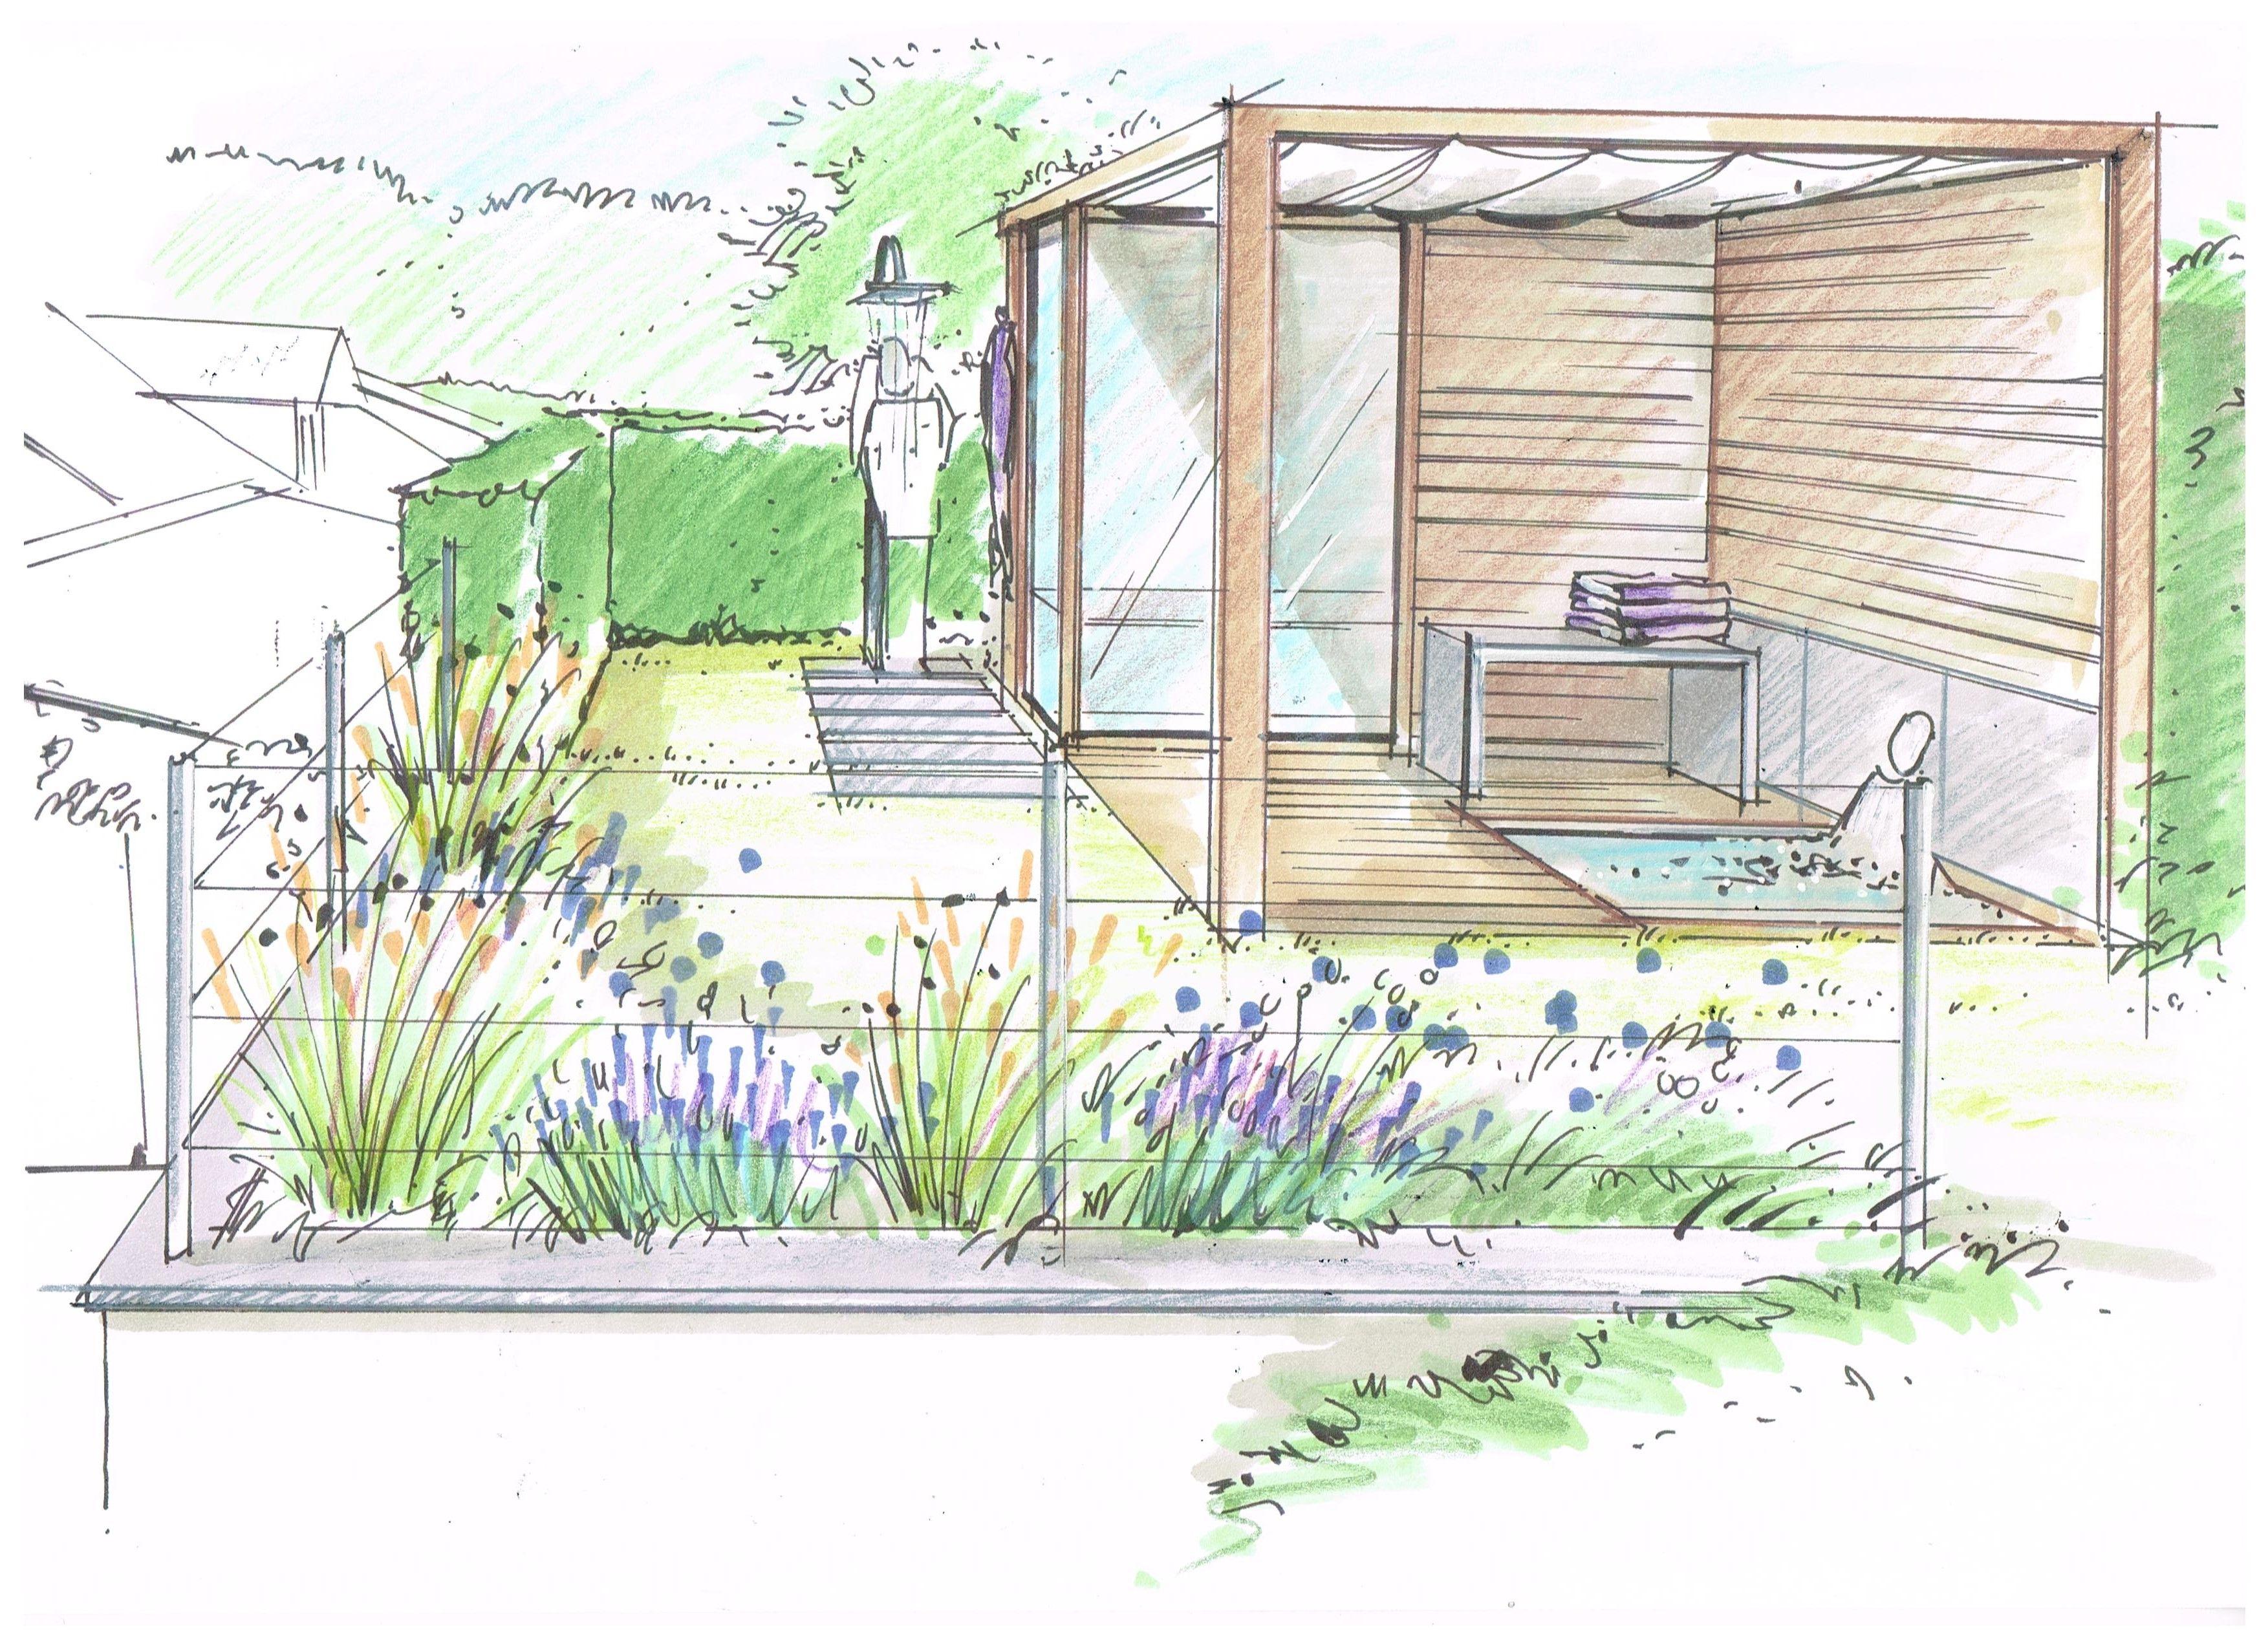 Perspektive Hausgarten Anne Munstermann Haus Und Garten Garten Garten Ideen